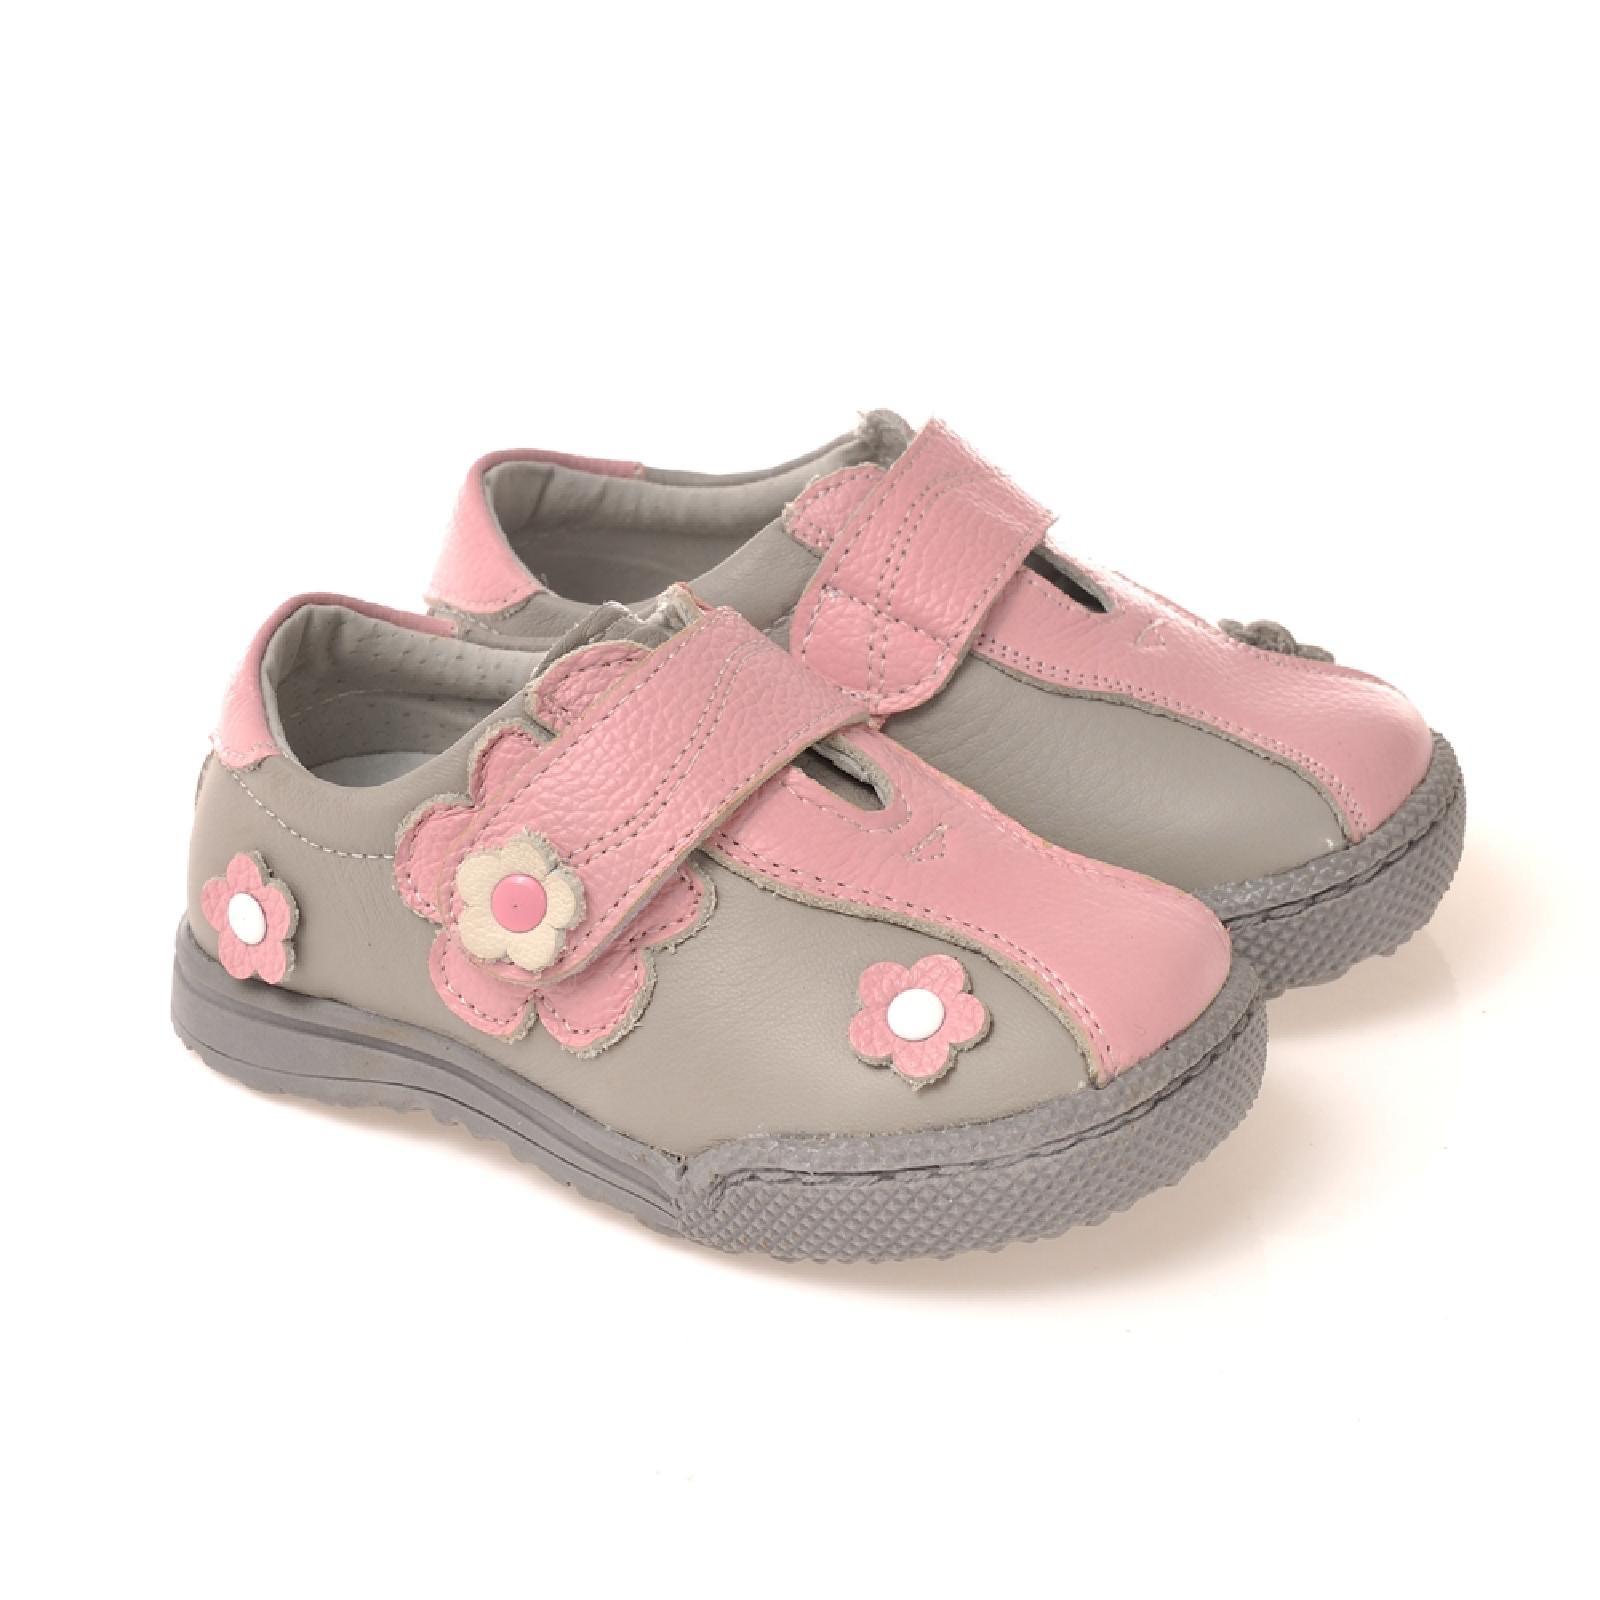 Indexbild 9 - Caroch Mädchen Sneaker Kinderschuhe Halbschuhe aus Leder